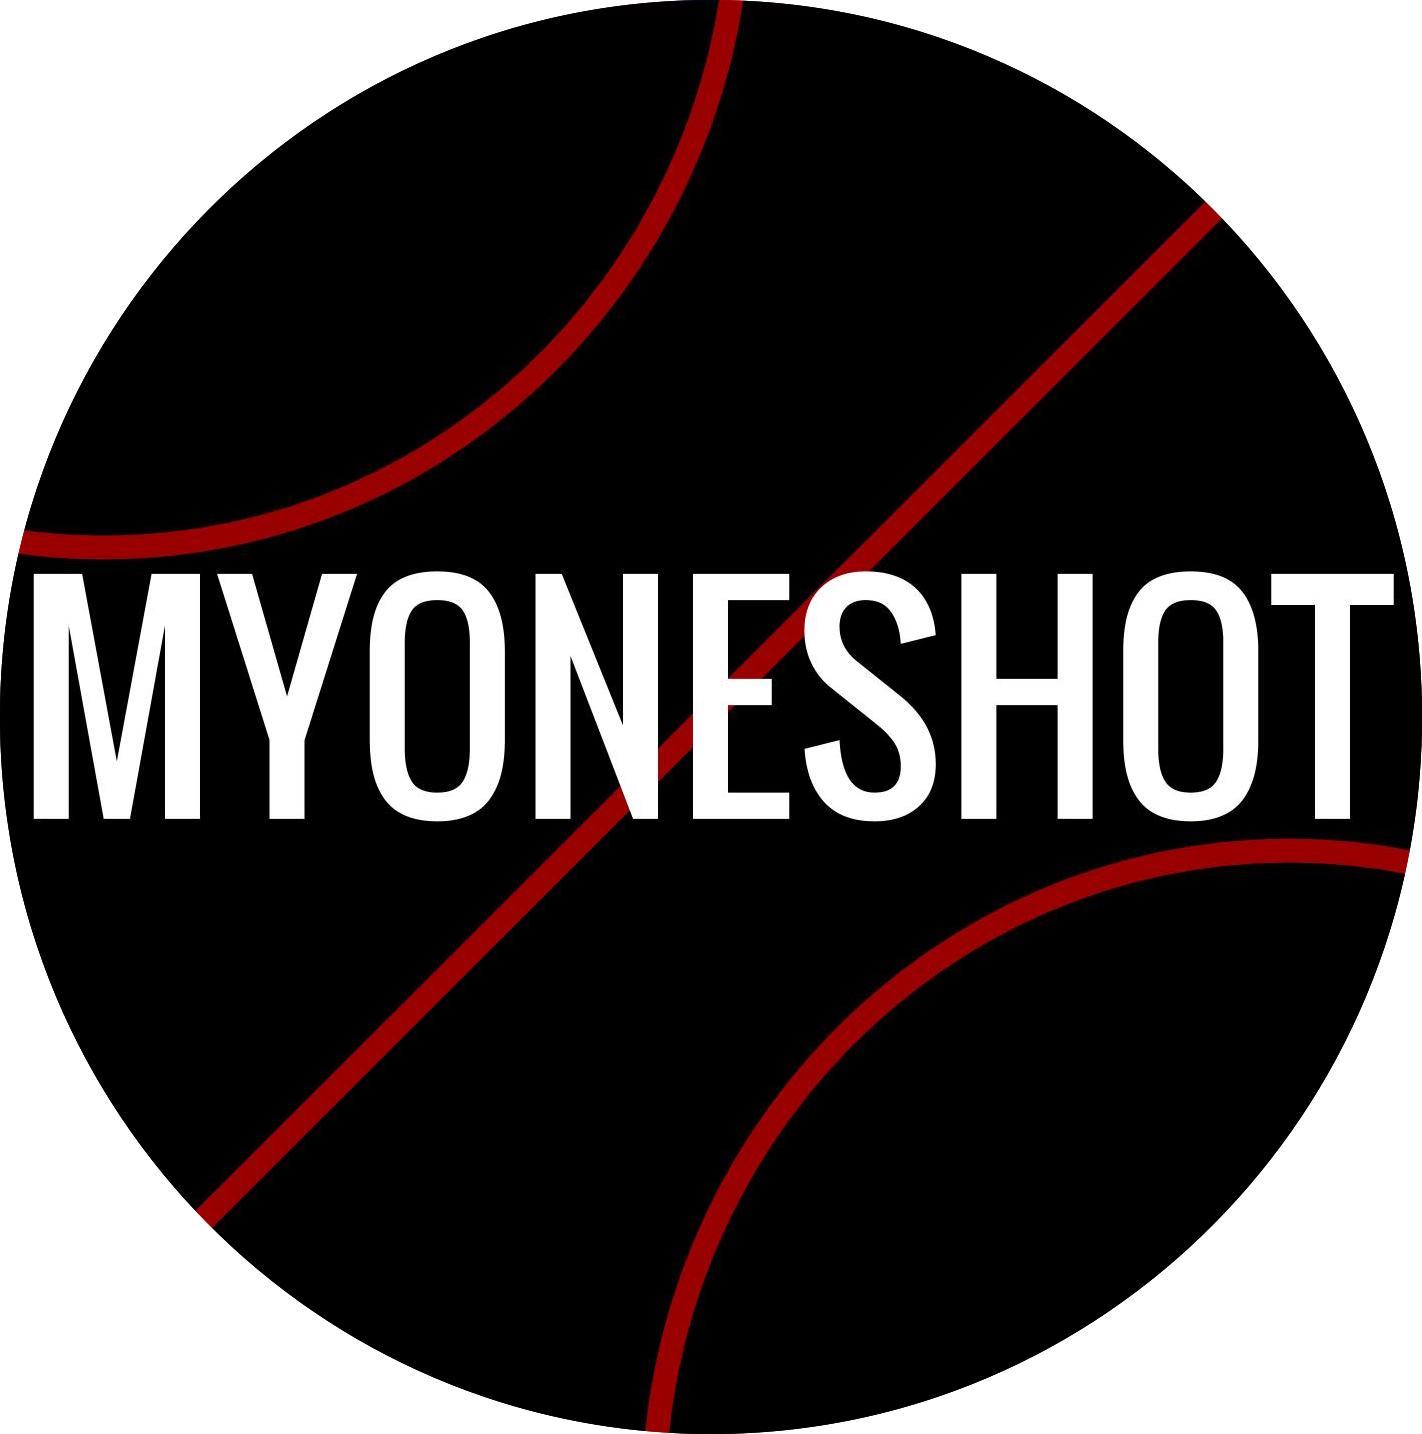 myoneshot sports performance.jpg